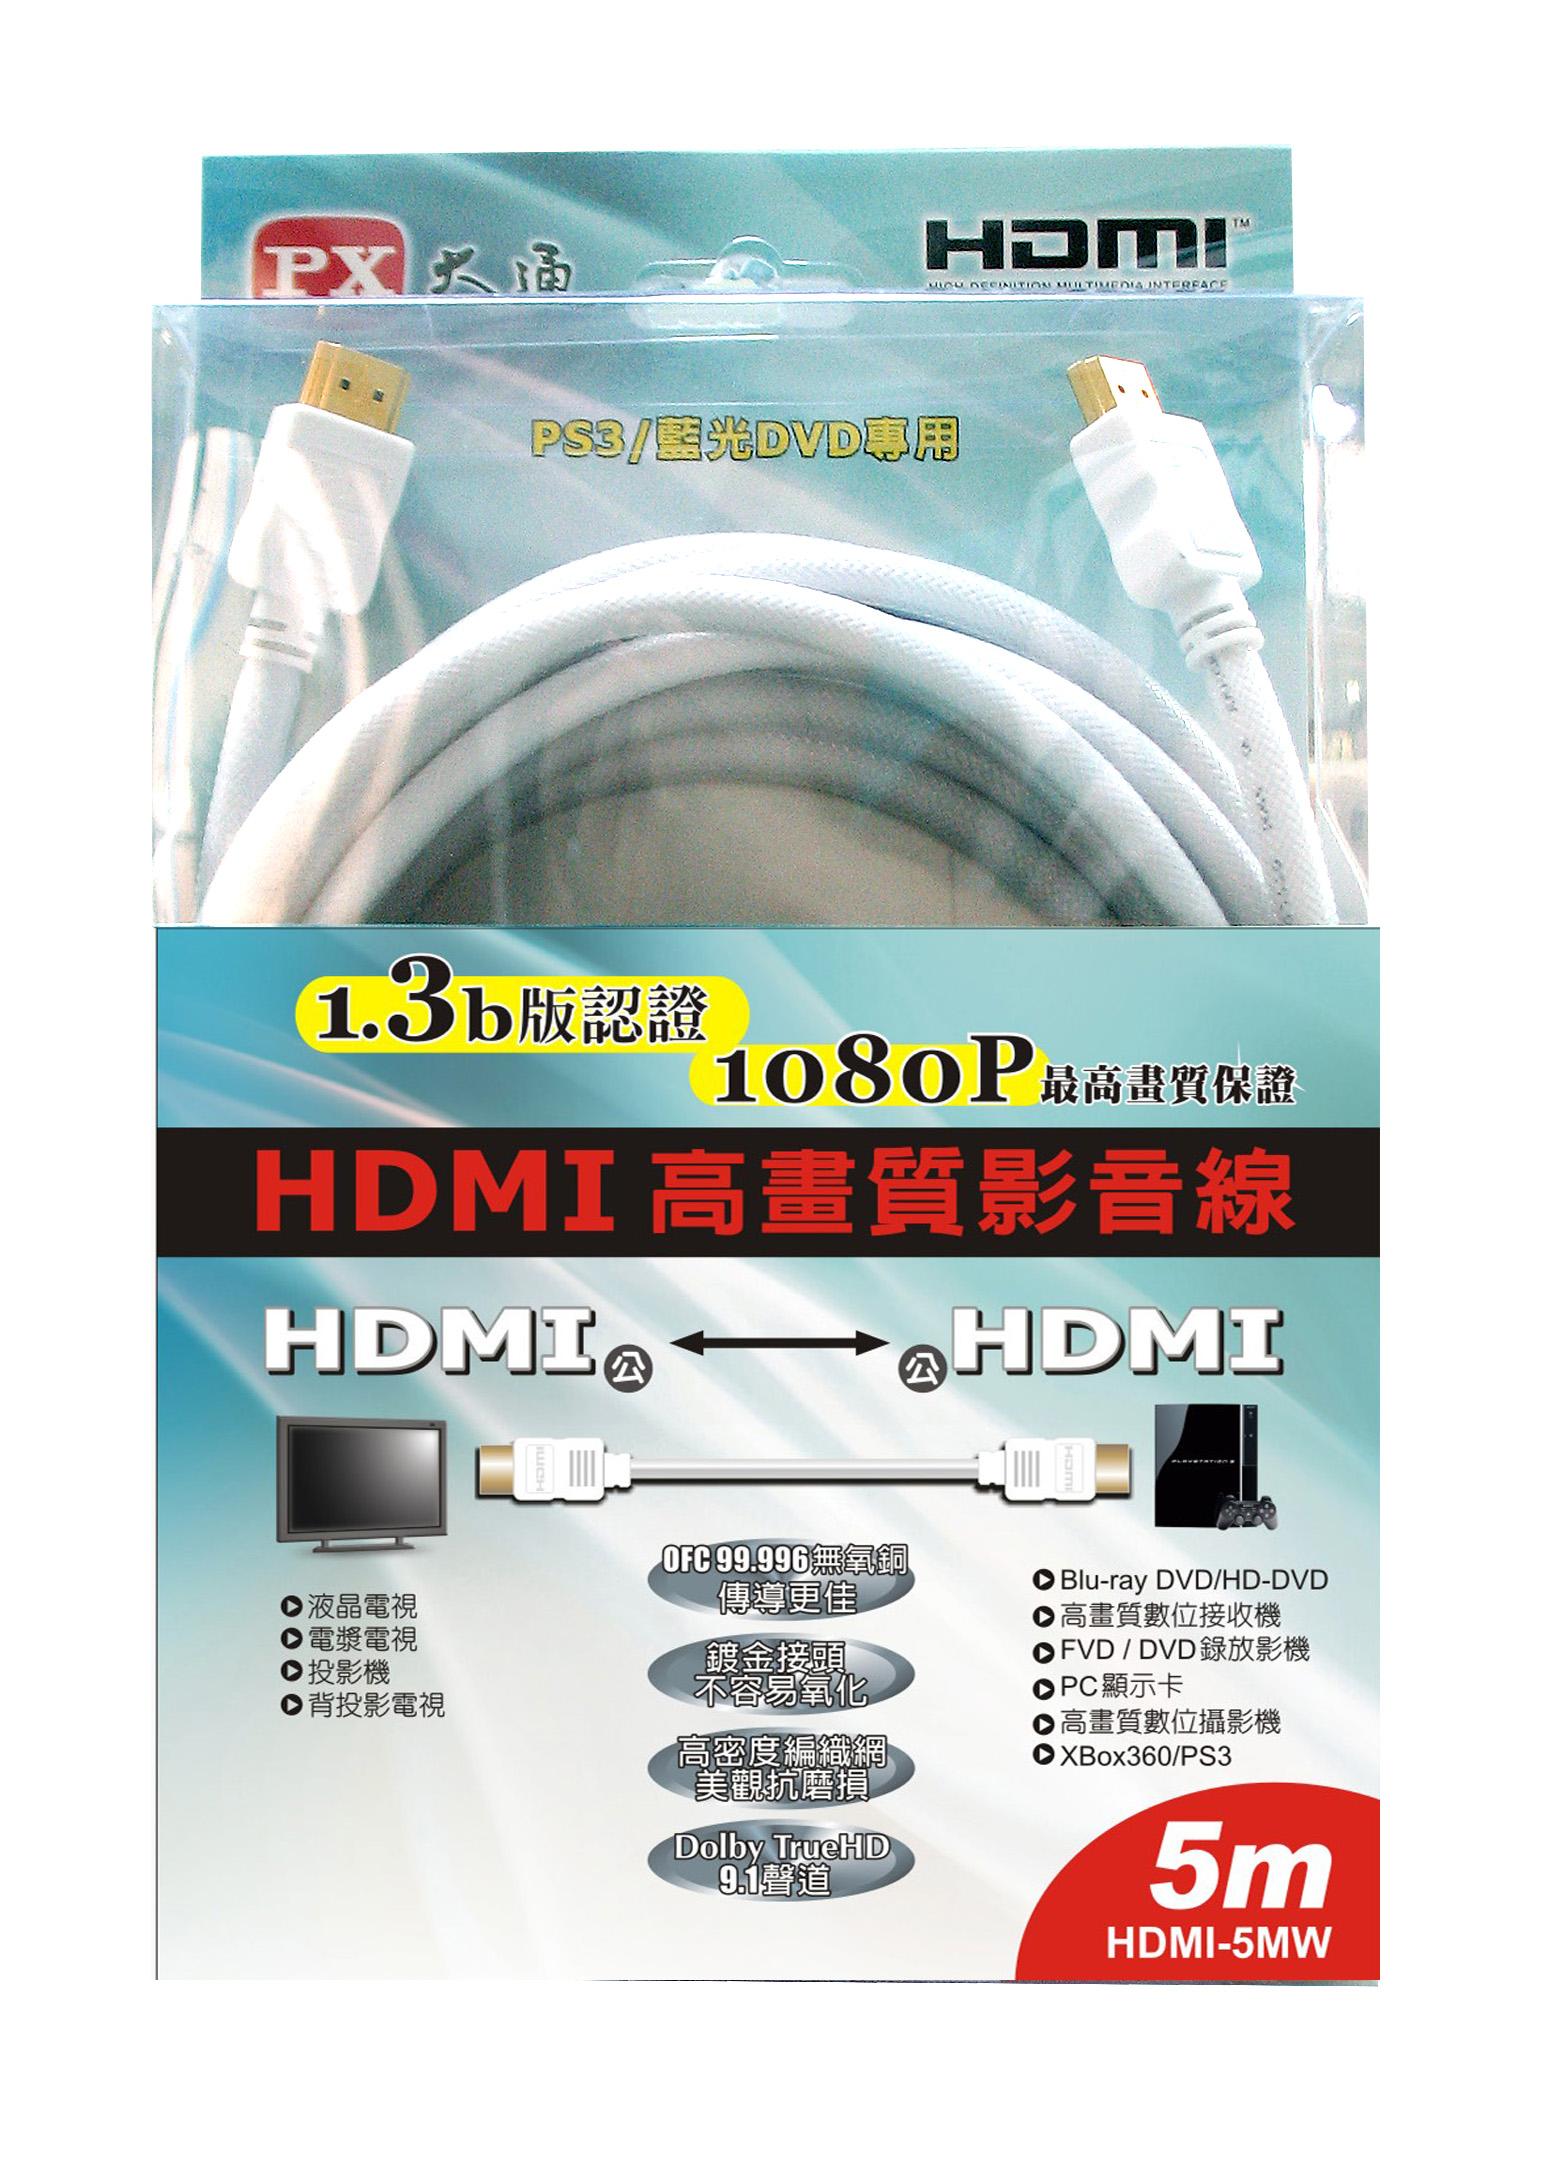 HDMI-5MW高画质白色影音线